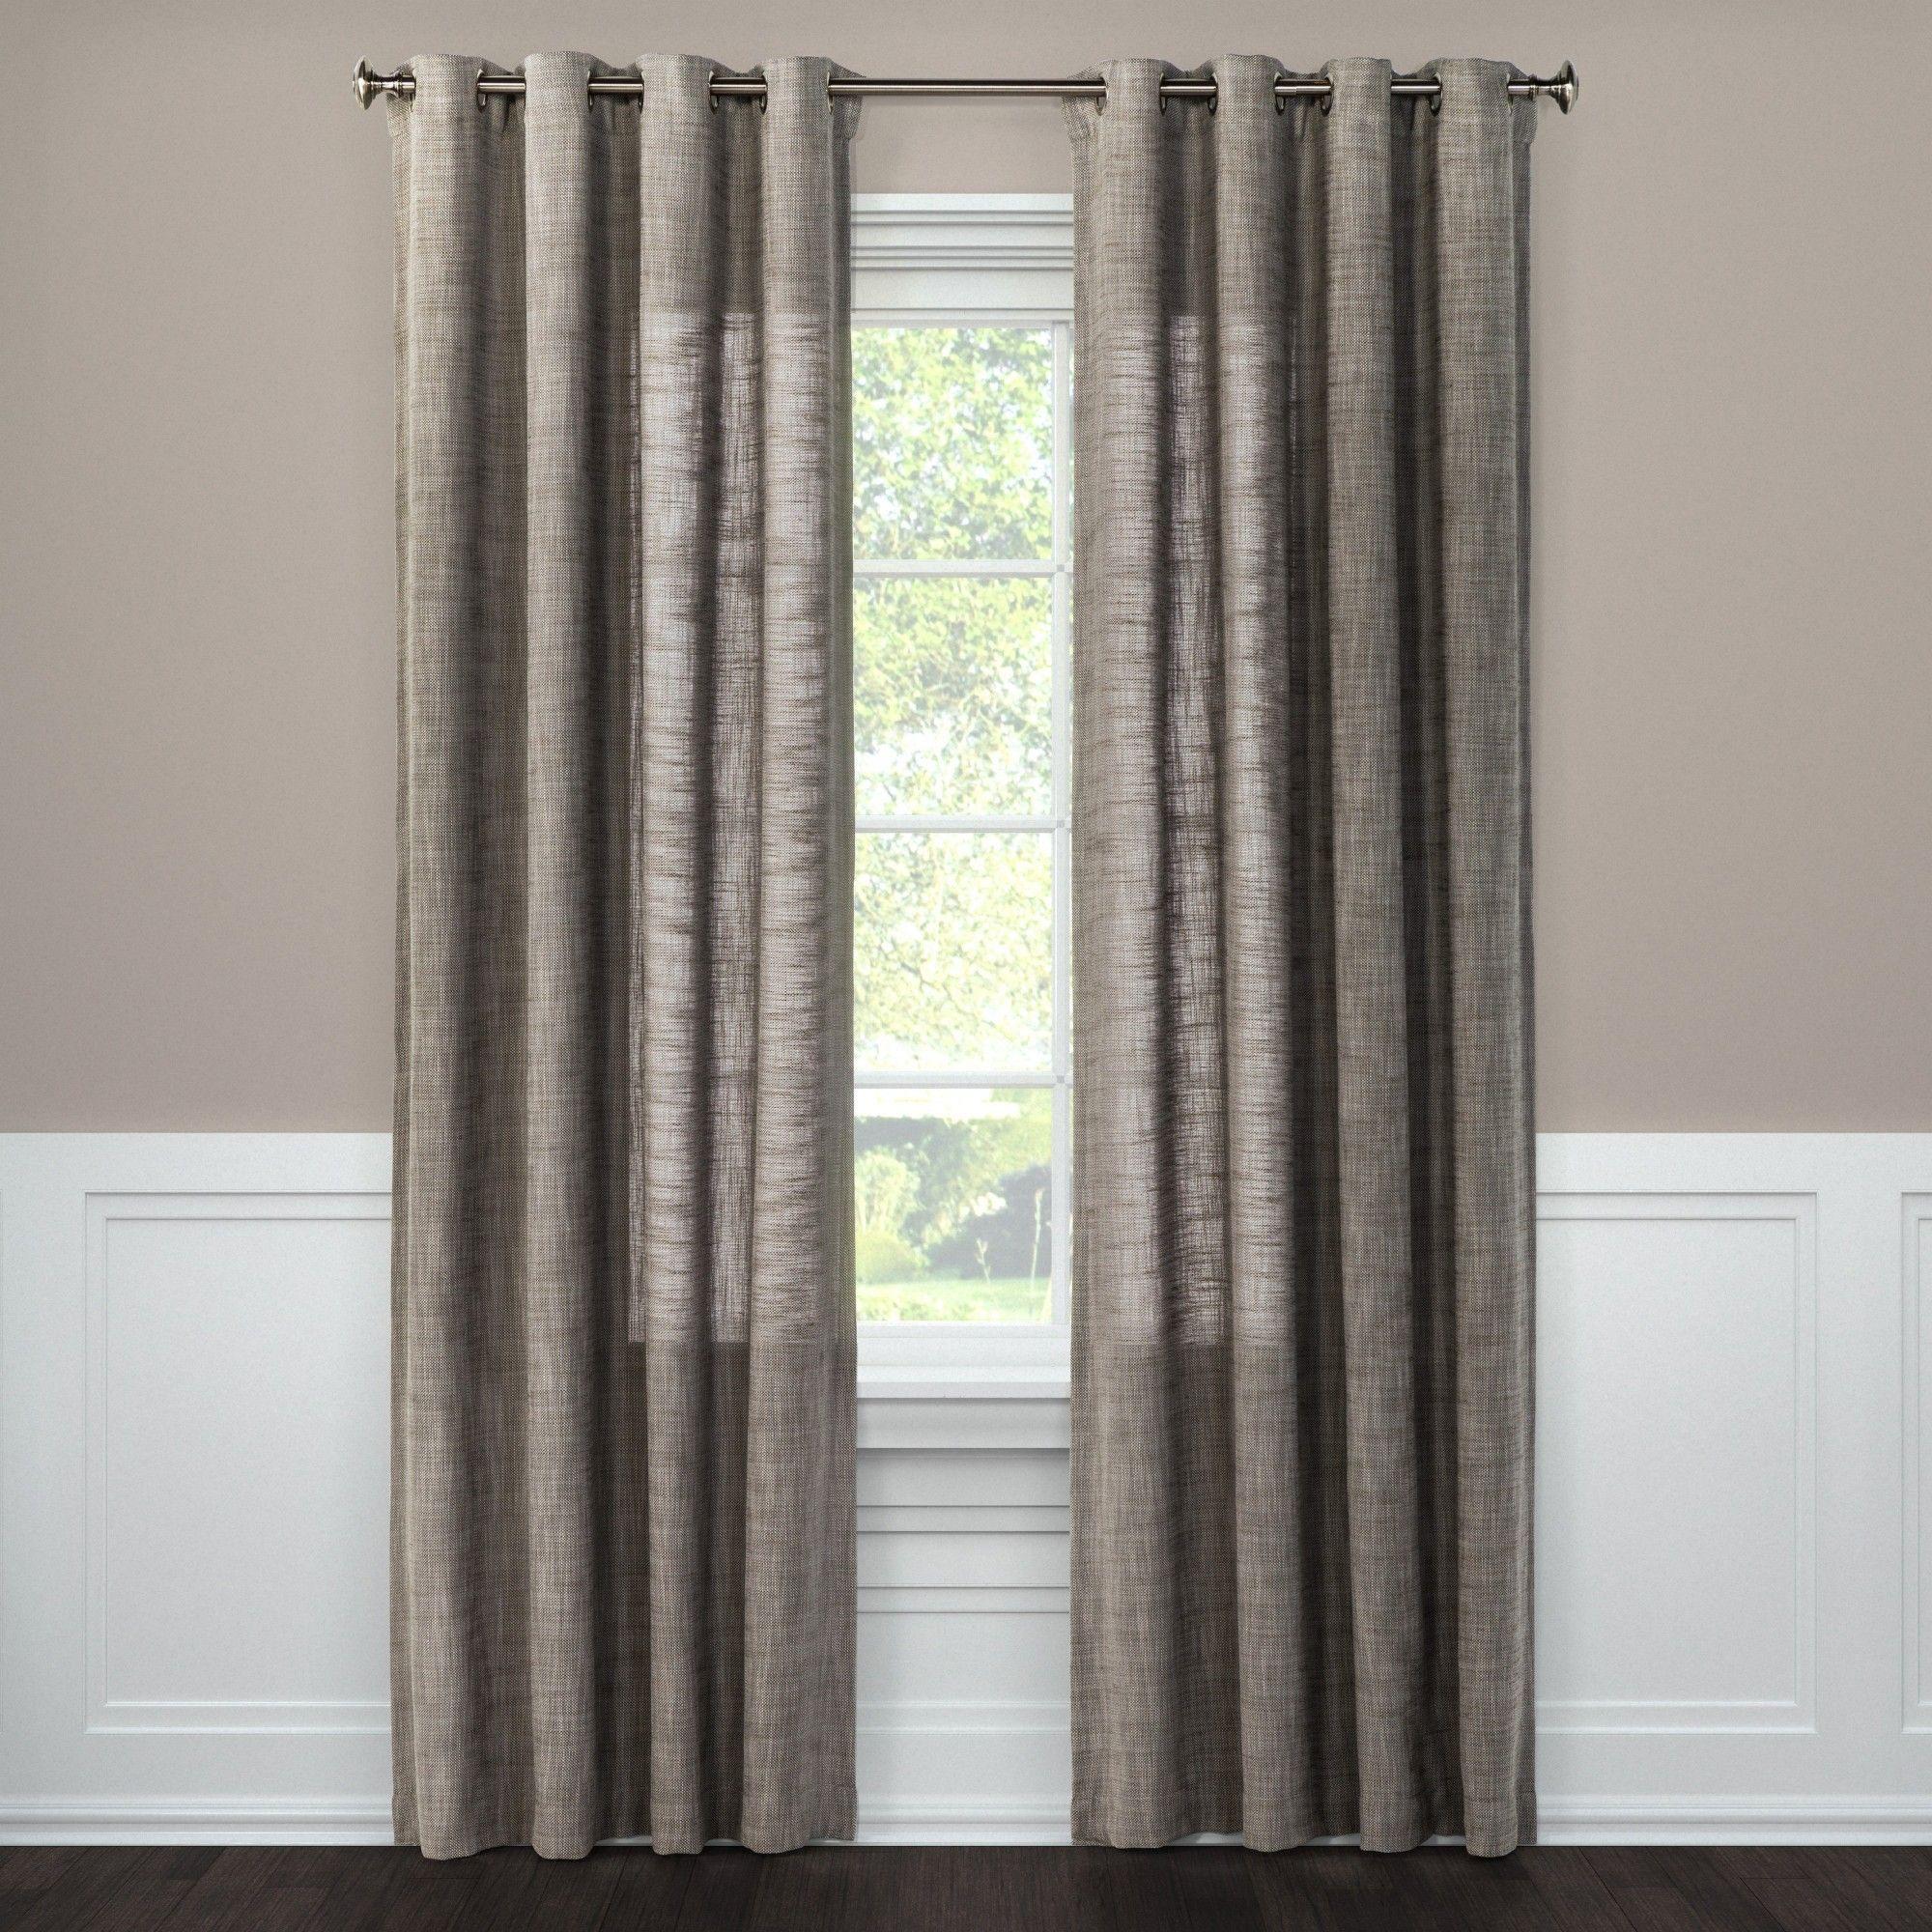 Textured Weave Window Curtain Panel Gray 54 X108 Threshold